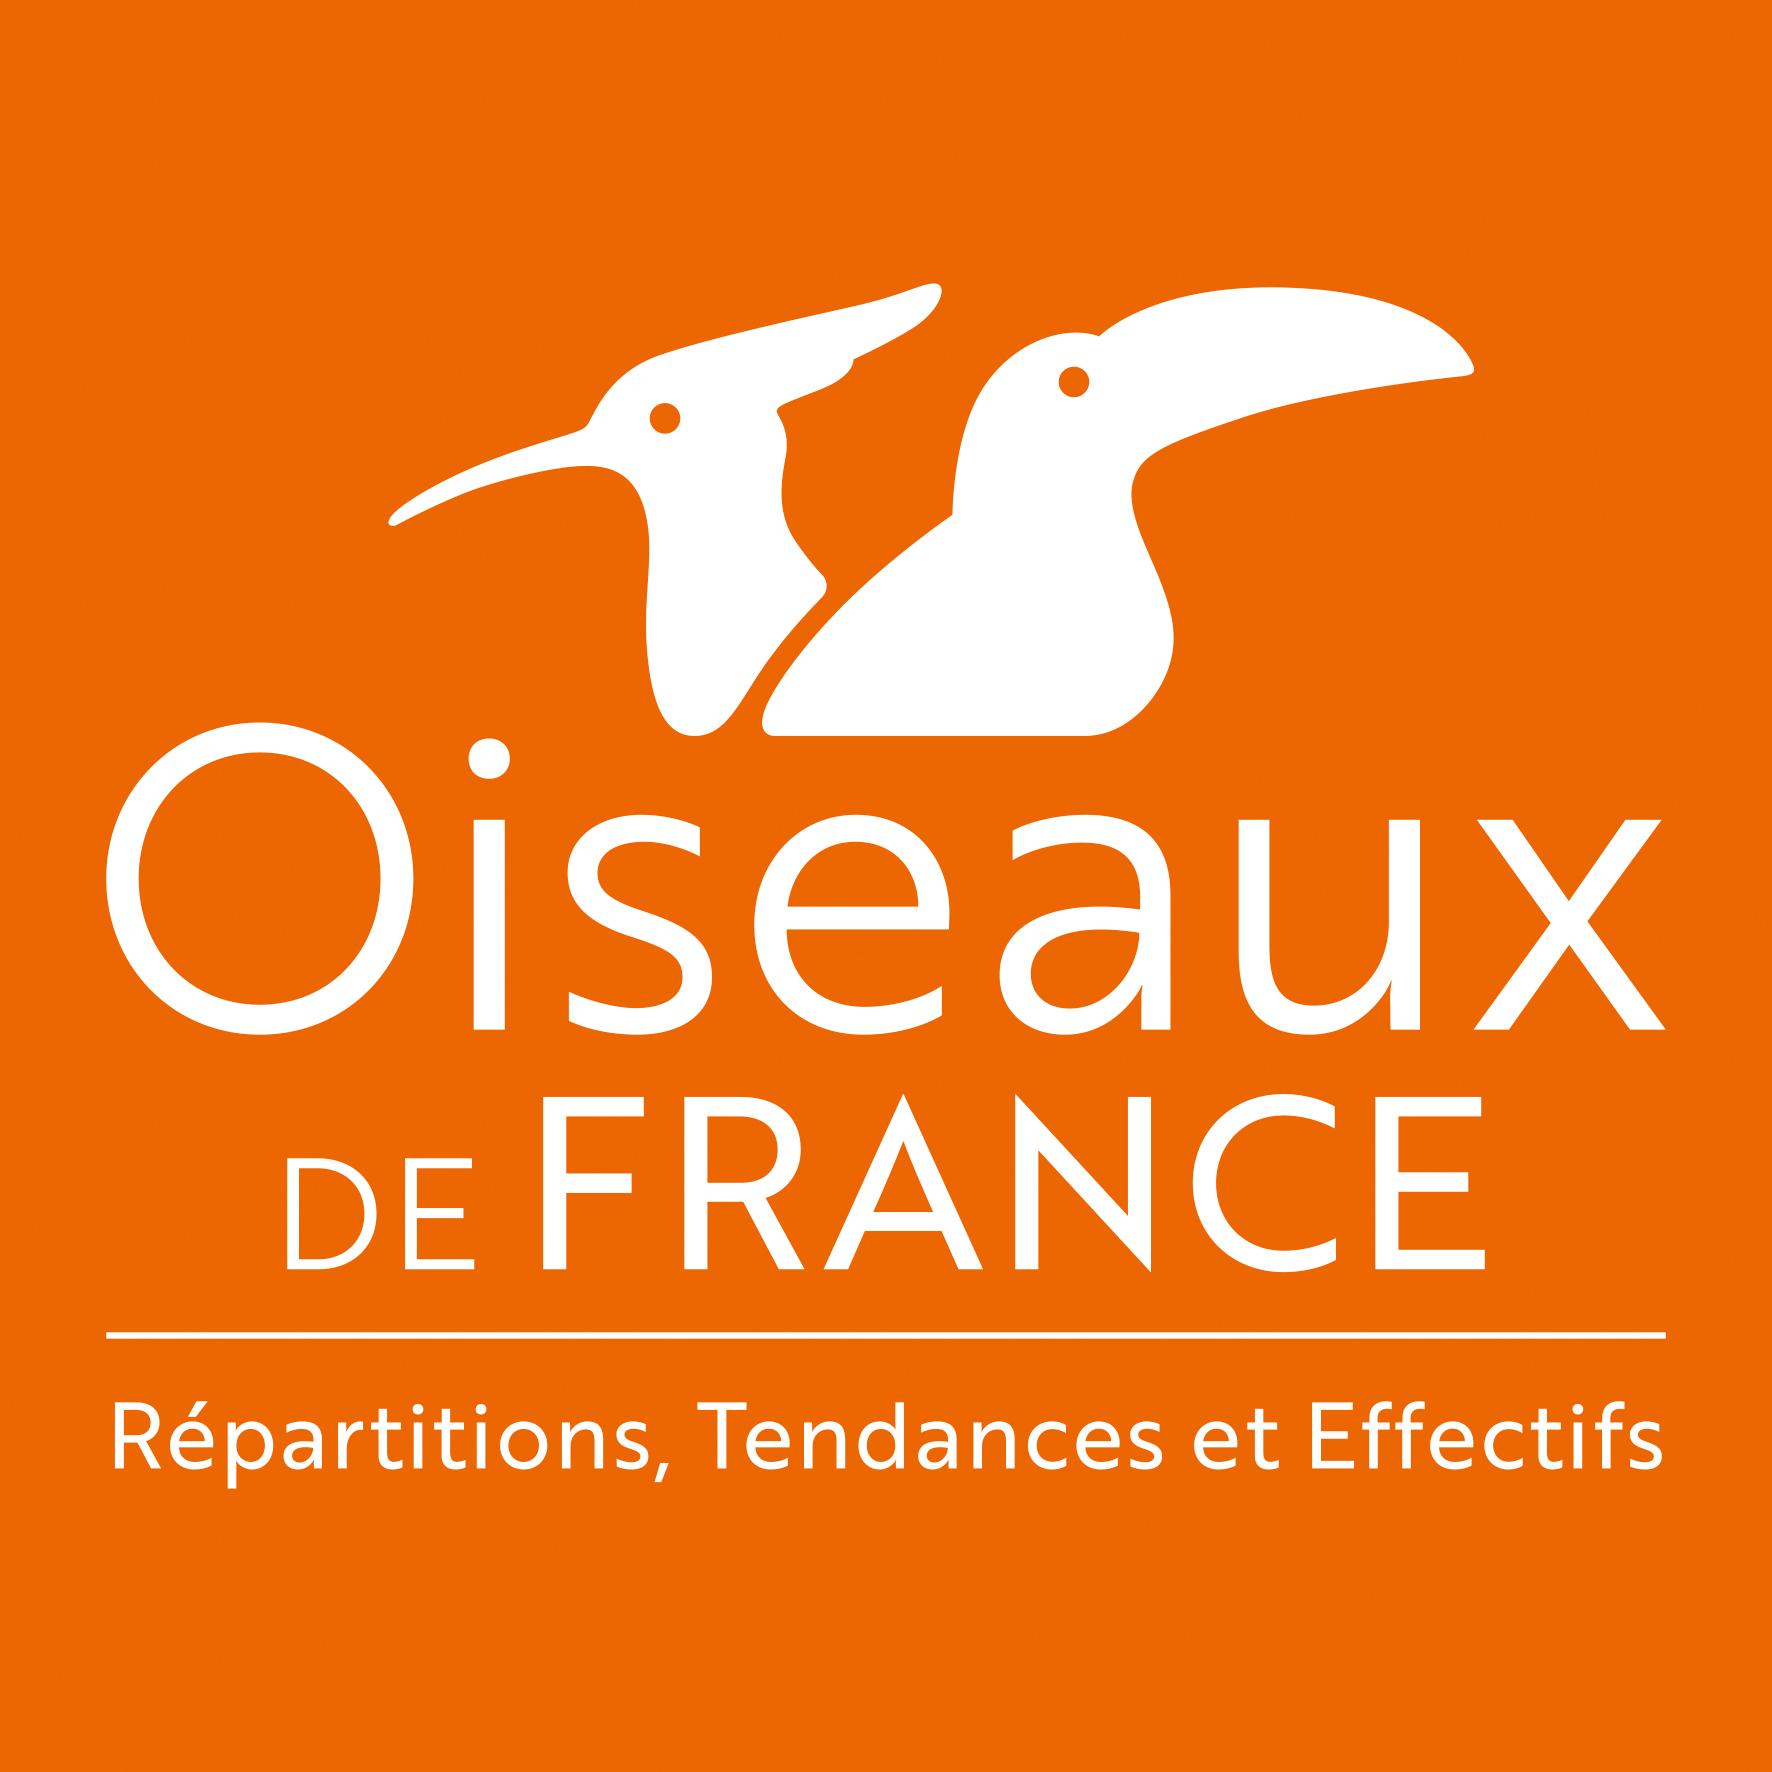 https://cdnfiles1.biolovision.net/www.faune-lr.org/userfiles/Publications/OiseauxDeFranceBloc.jpg